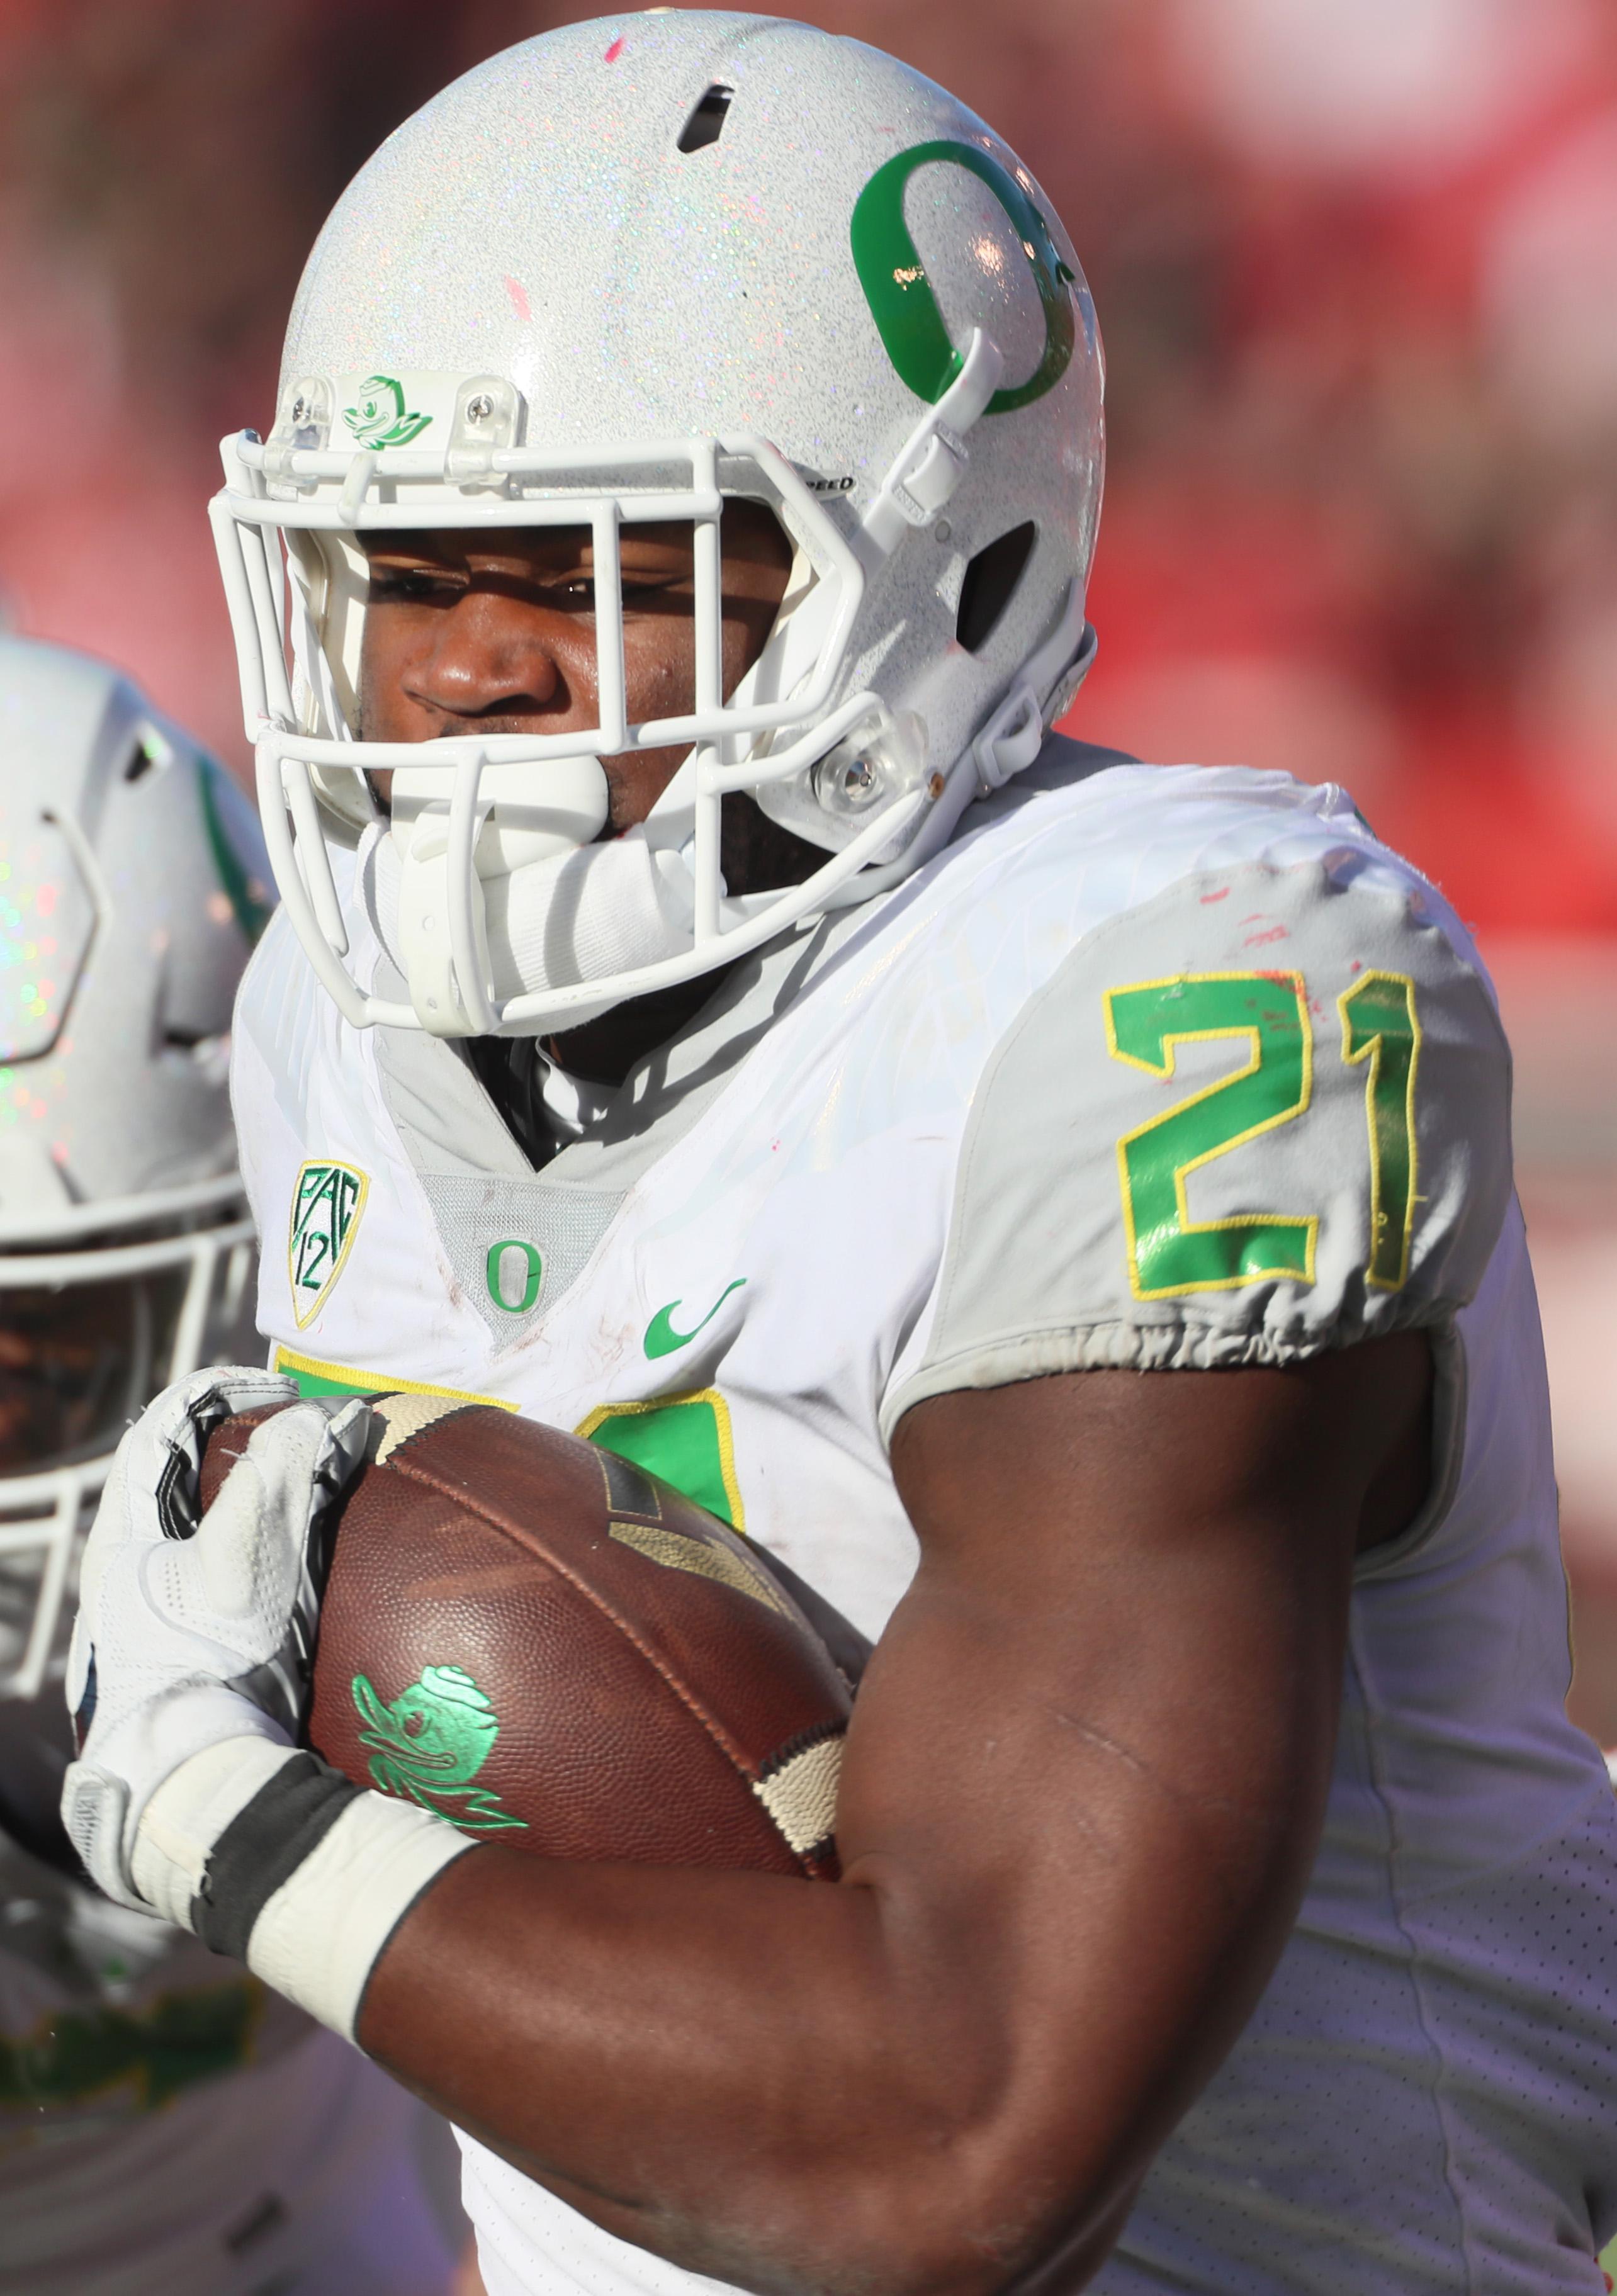 Oregon running back Royce Freeman (21) runs the ball in the second half during an NCAA college football game against Utah, Saturday, Nov. 19, 2016, in Salt Lake City. Oregon defeated Utah 30-28. (AP Photo/George Frey)